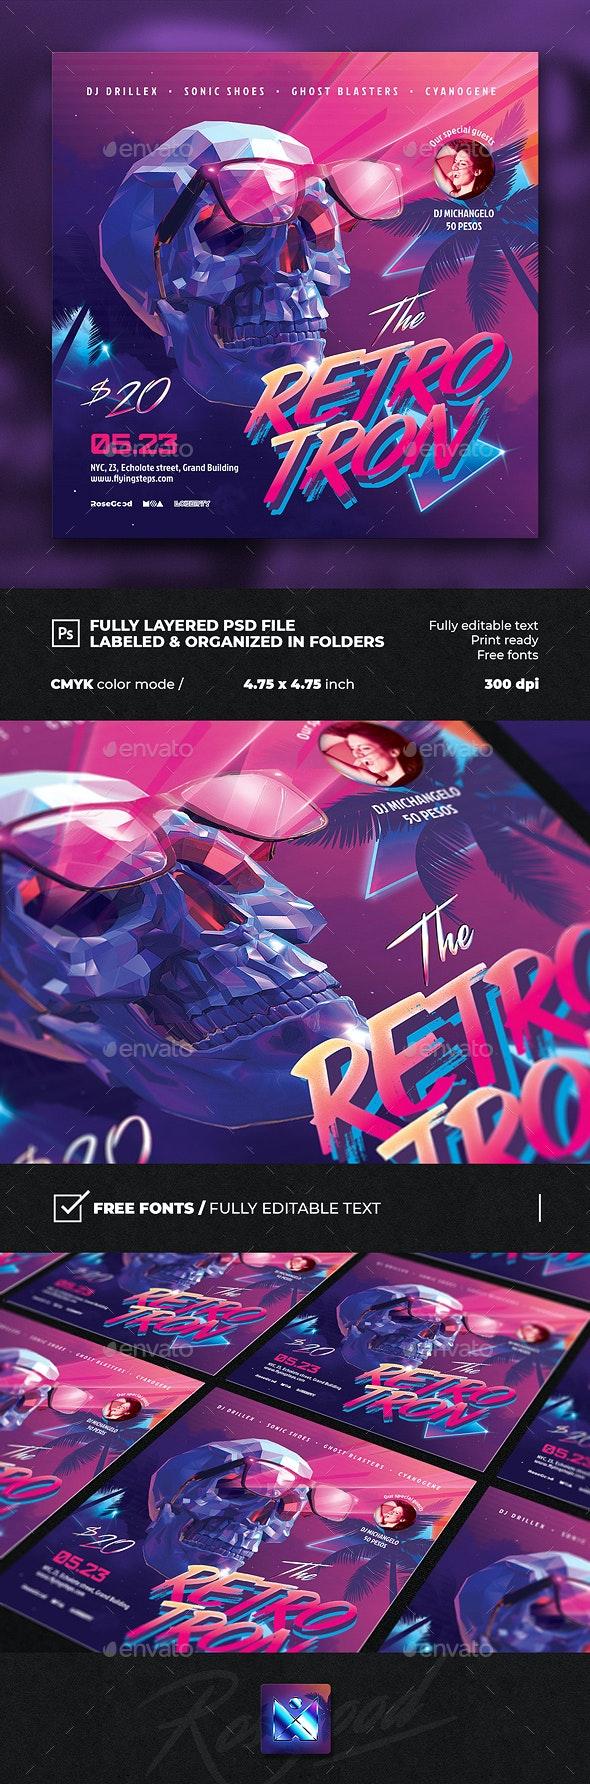 Retro Tron 80s DJ Party Flyer - Events Flyers